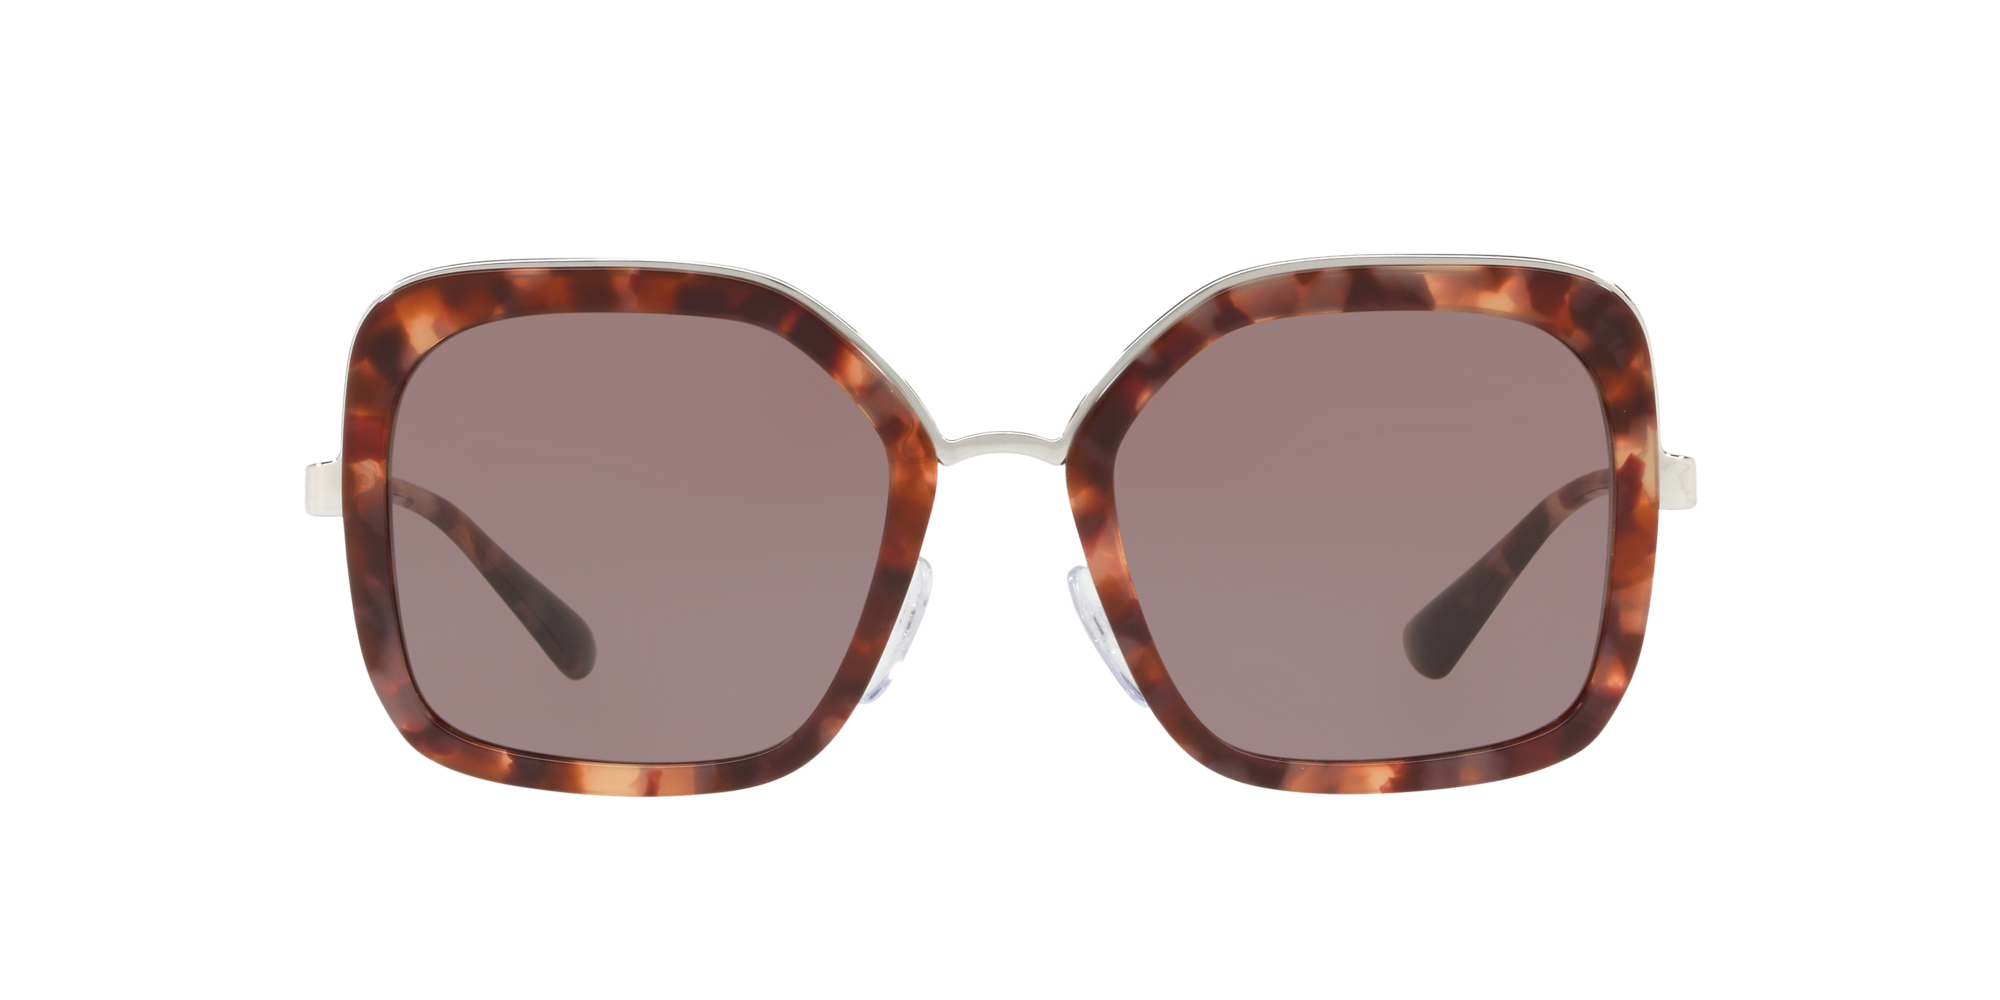 Image for PR 57US 54 from LensCrafters | Glasses, Prescription Glasses Online, Eyewear